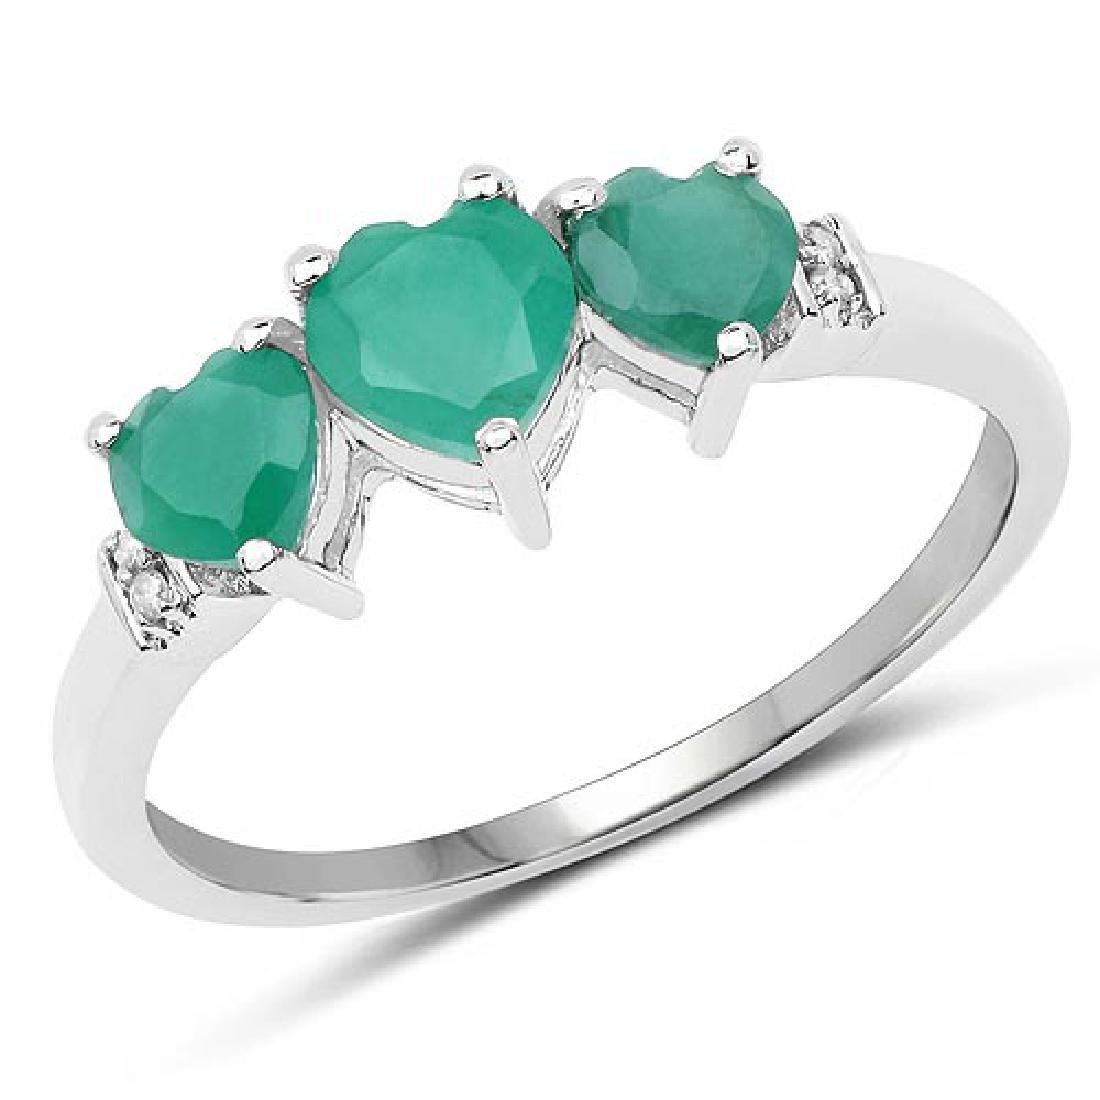 0.97 Carat Genuine Emerald and White Diamond 10K White